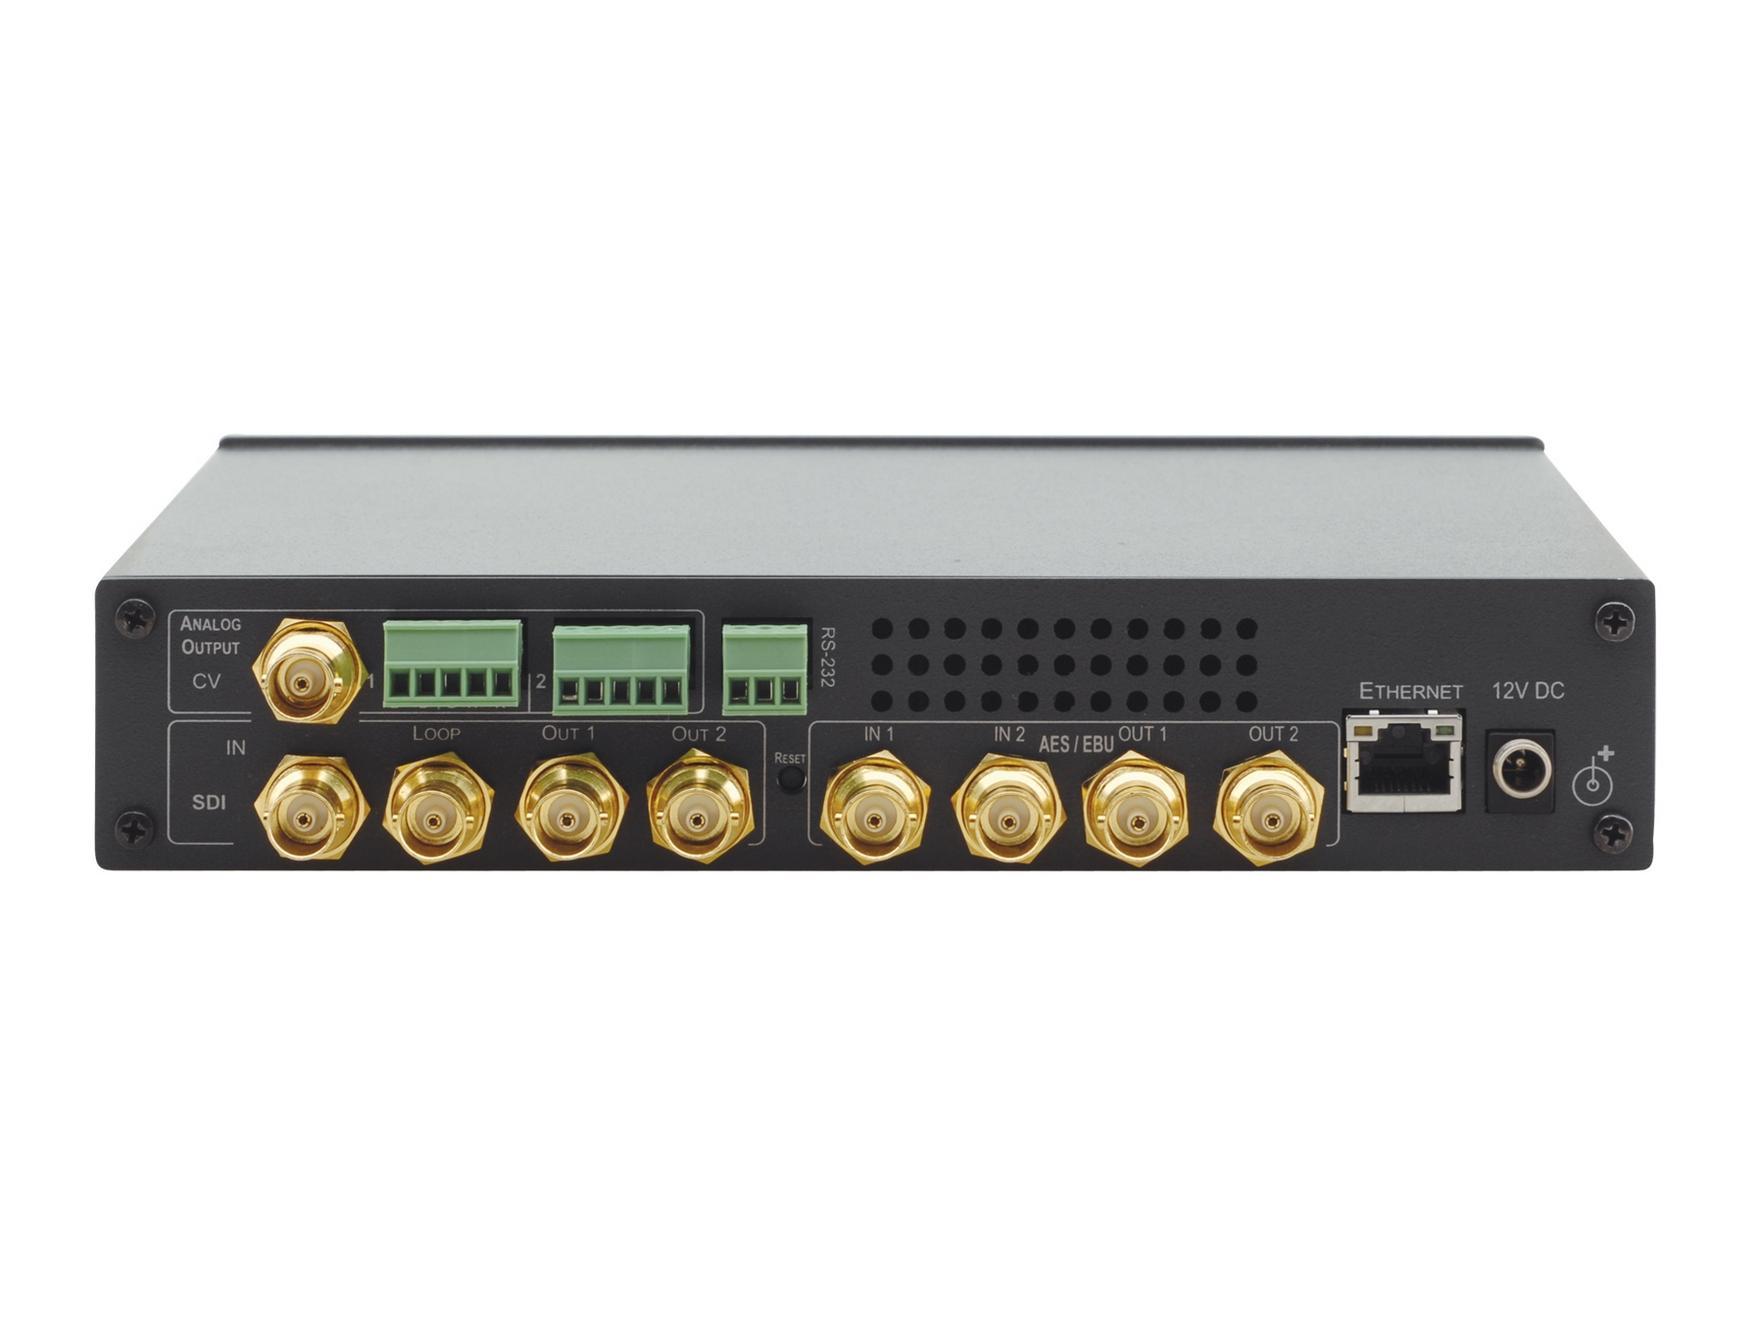 FC-340S 3G HD-SDI Scaler/Embedder/Scan Converter by Kramer